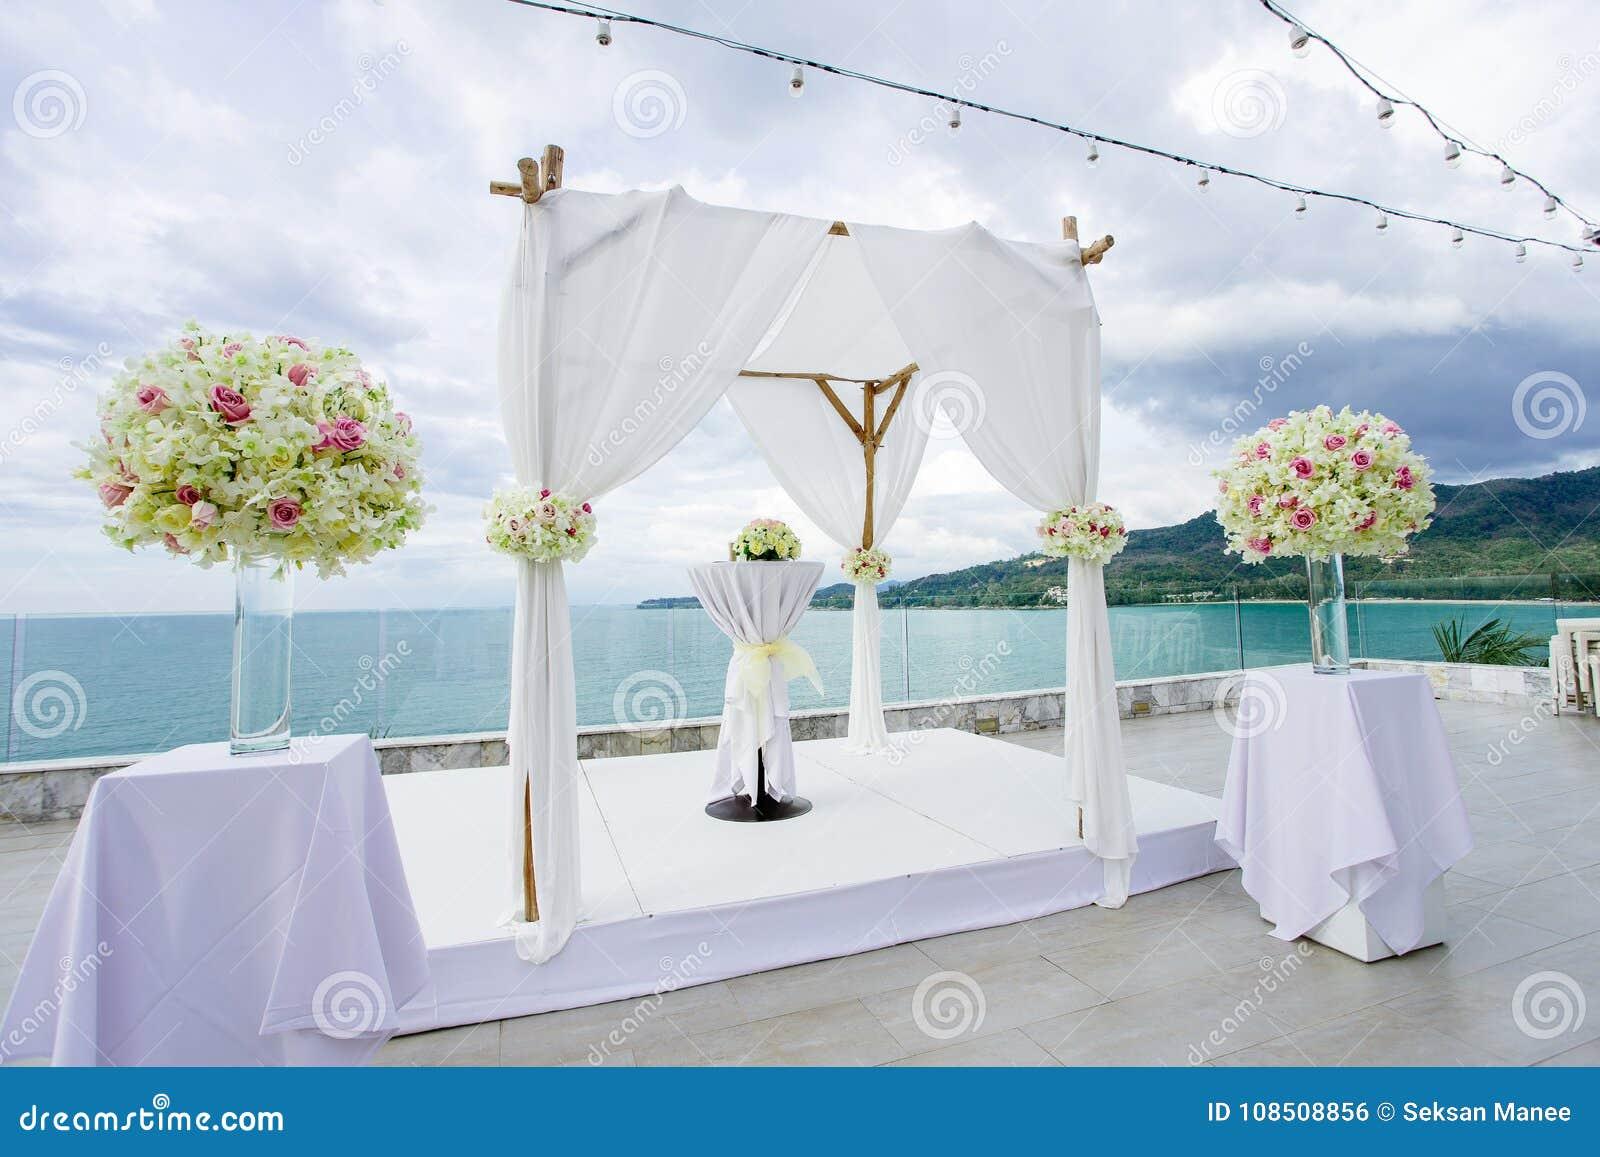 Wedding Arch Decoration, Flower, Floral, Beach Wedding Venue Stock ...